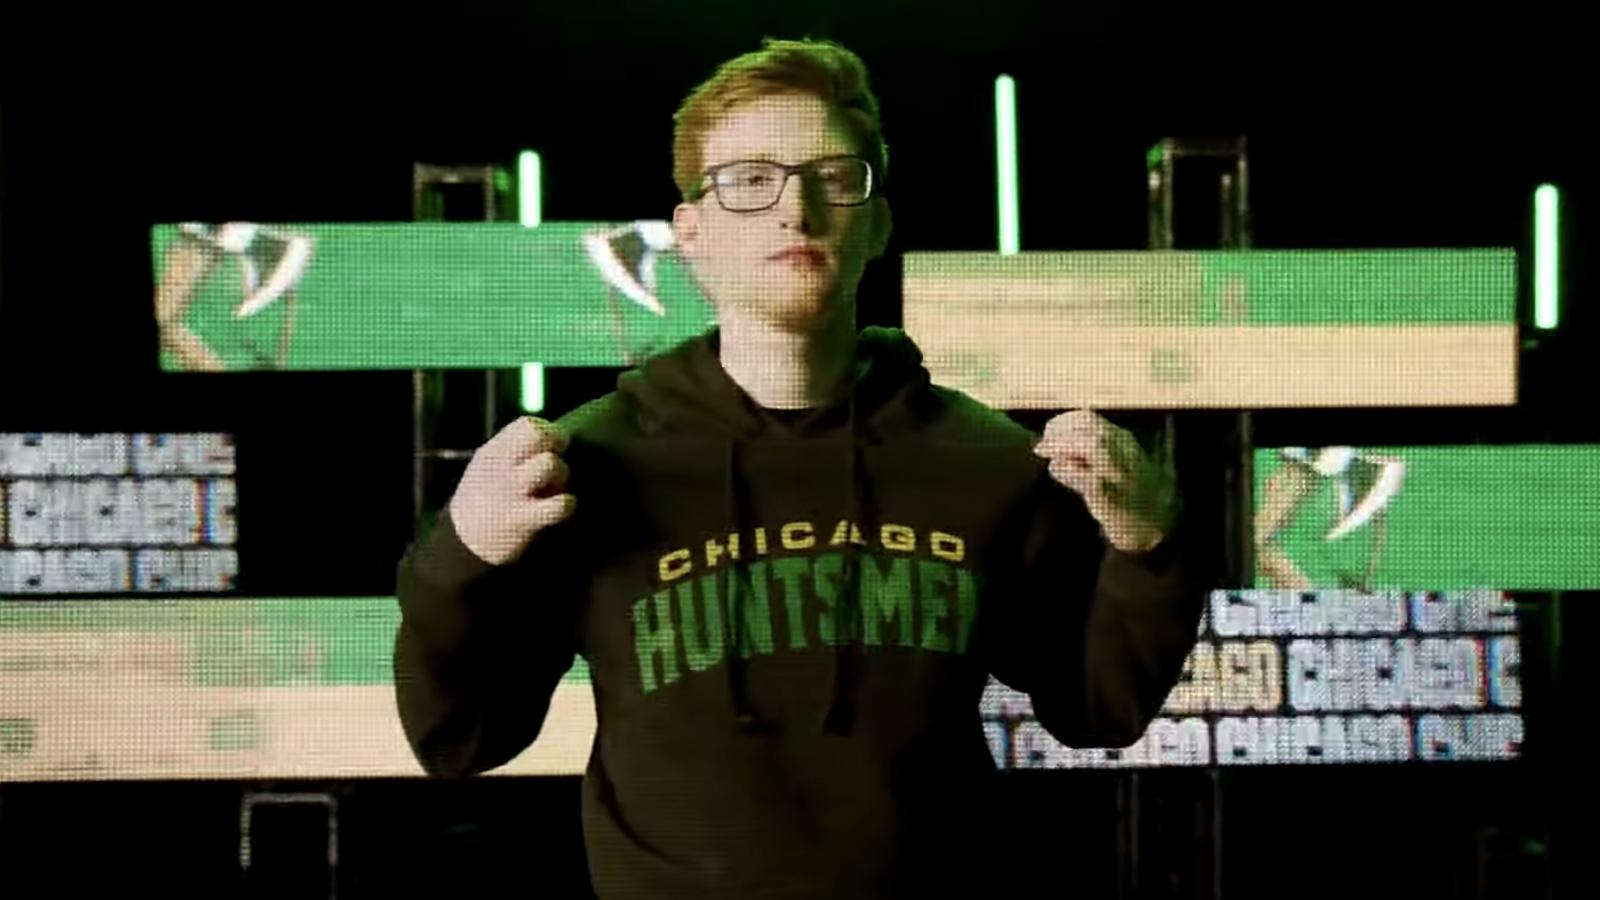 Scump in Chicago Hunstmen hoodie